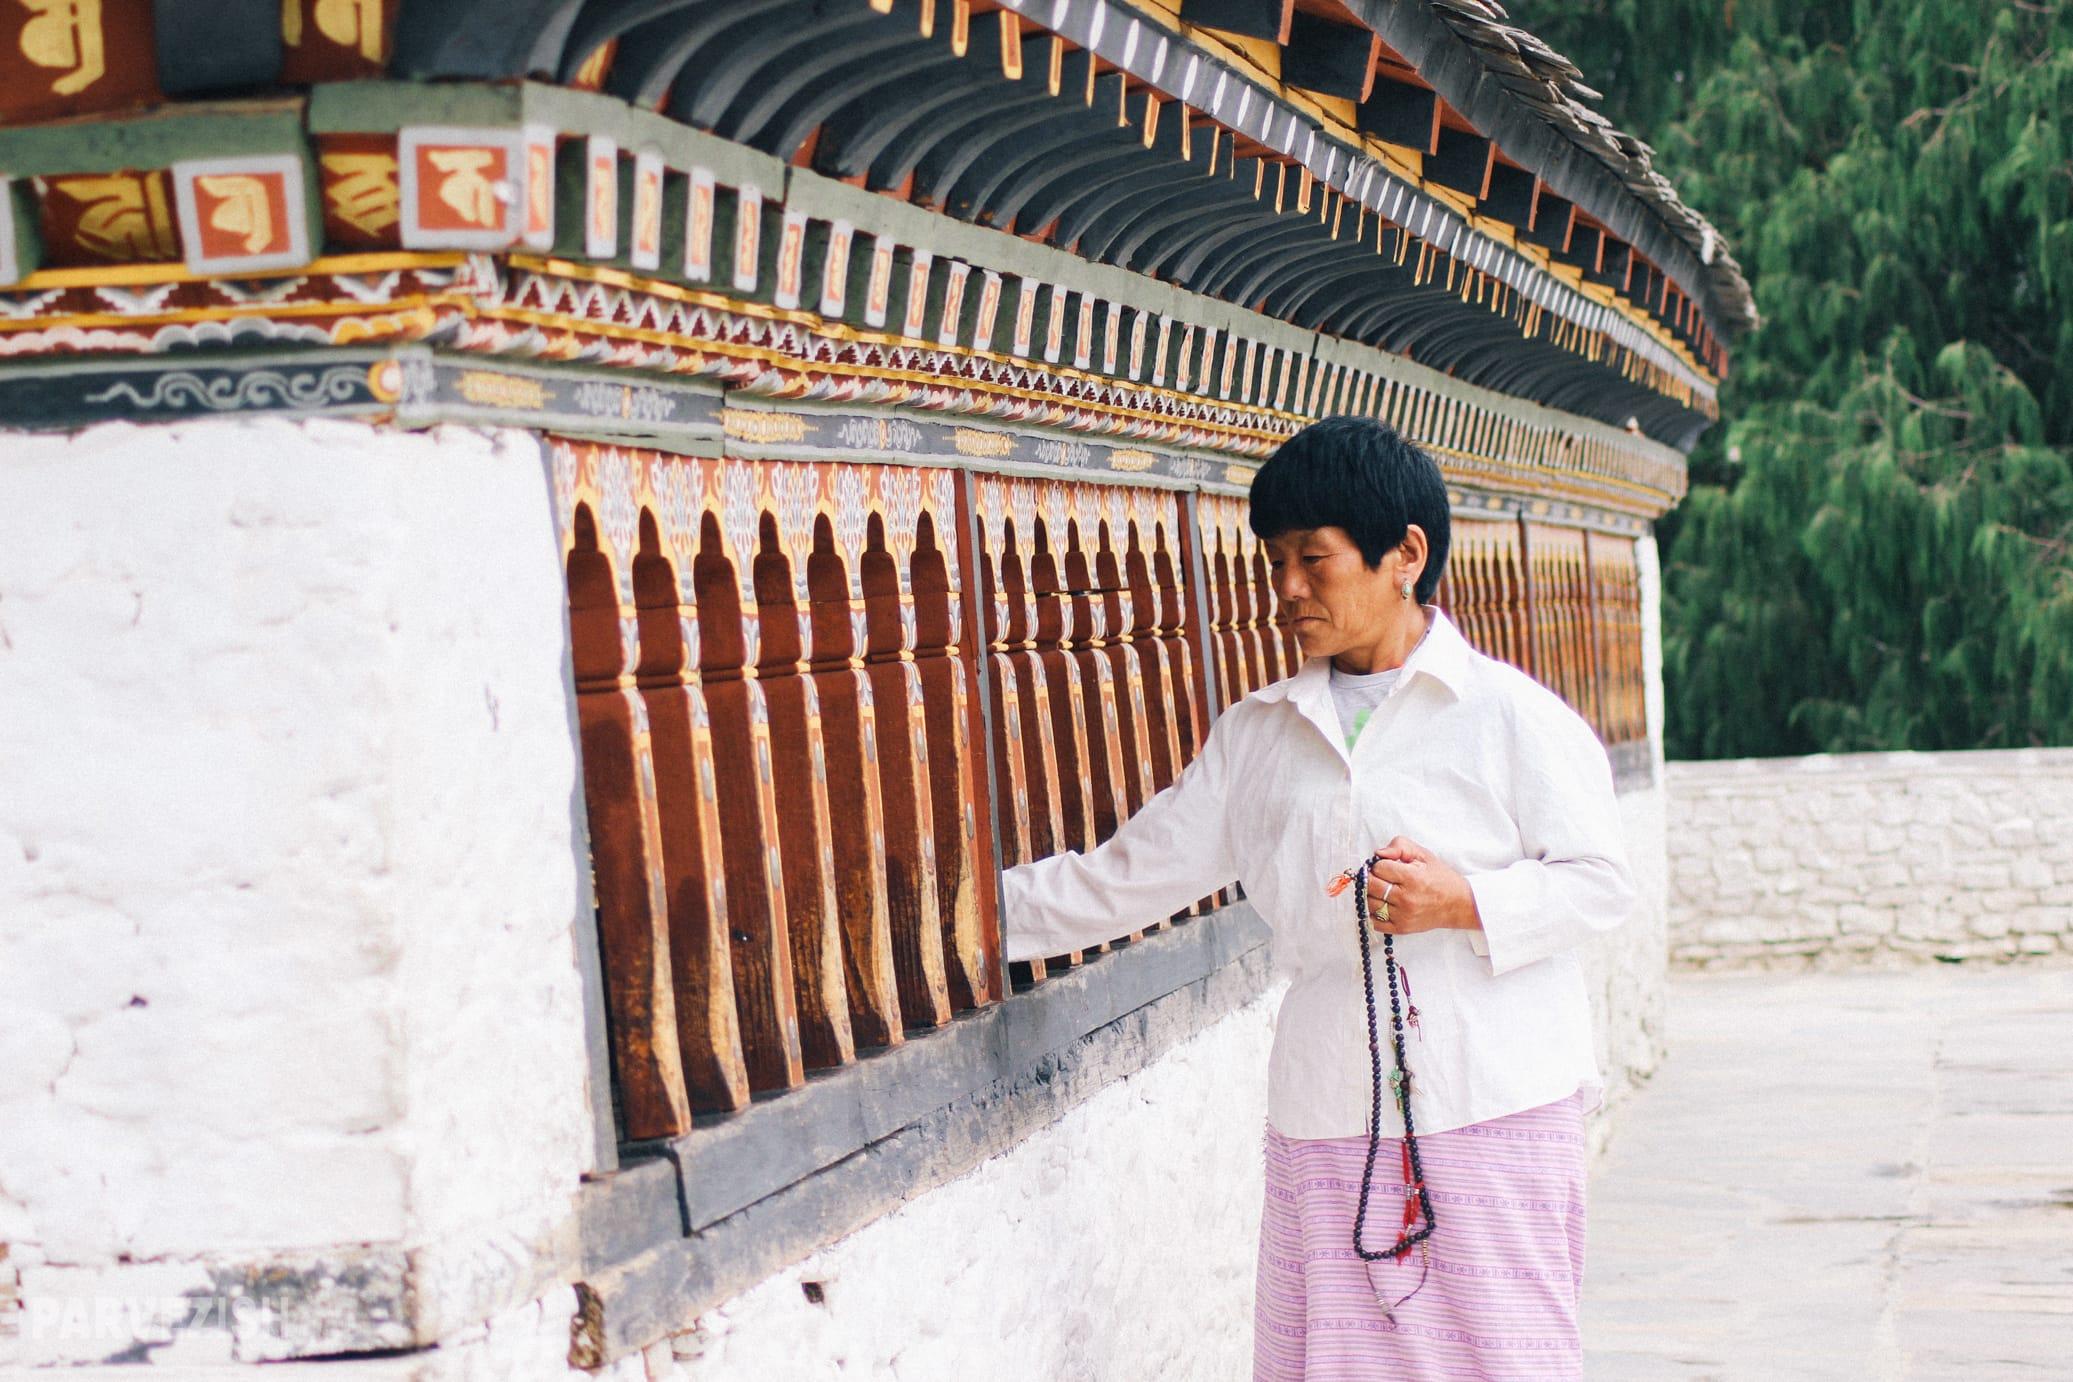 An Elderly Woman Praying at a Temple in Bhutan